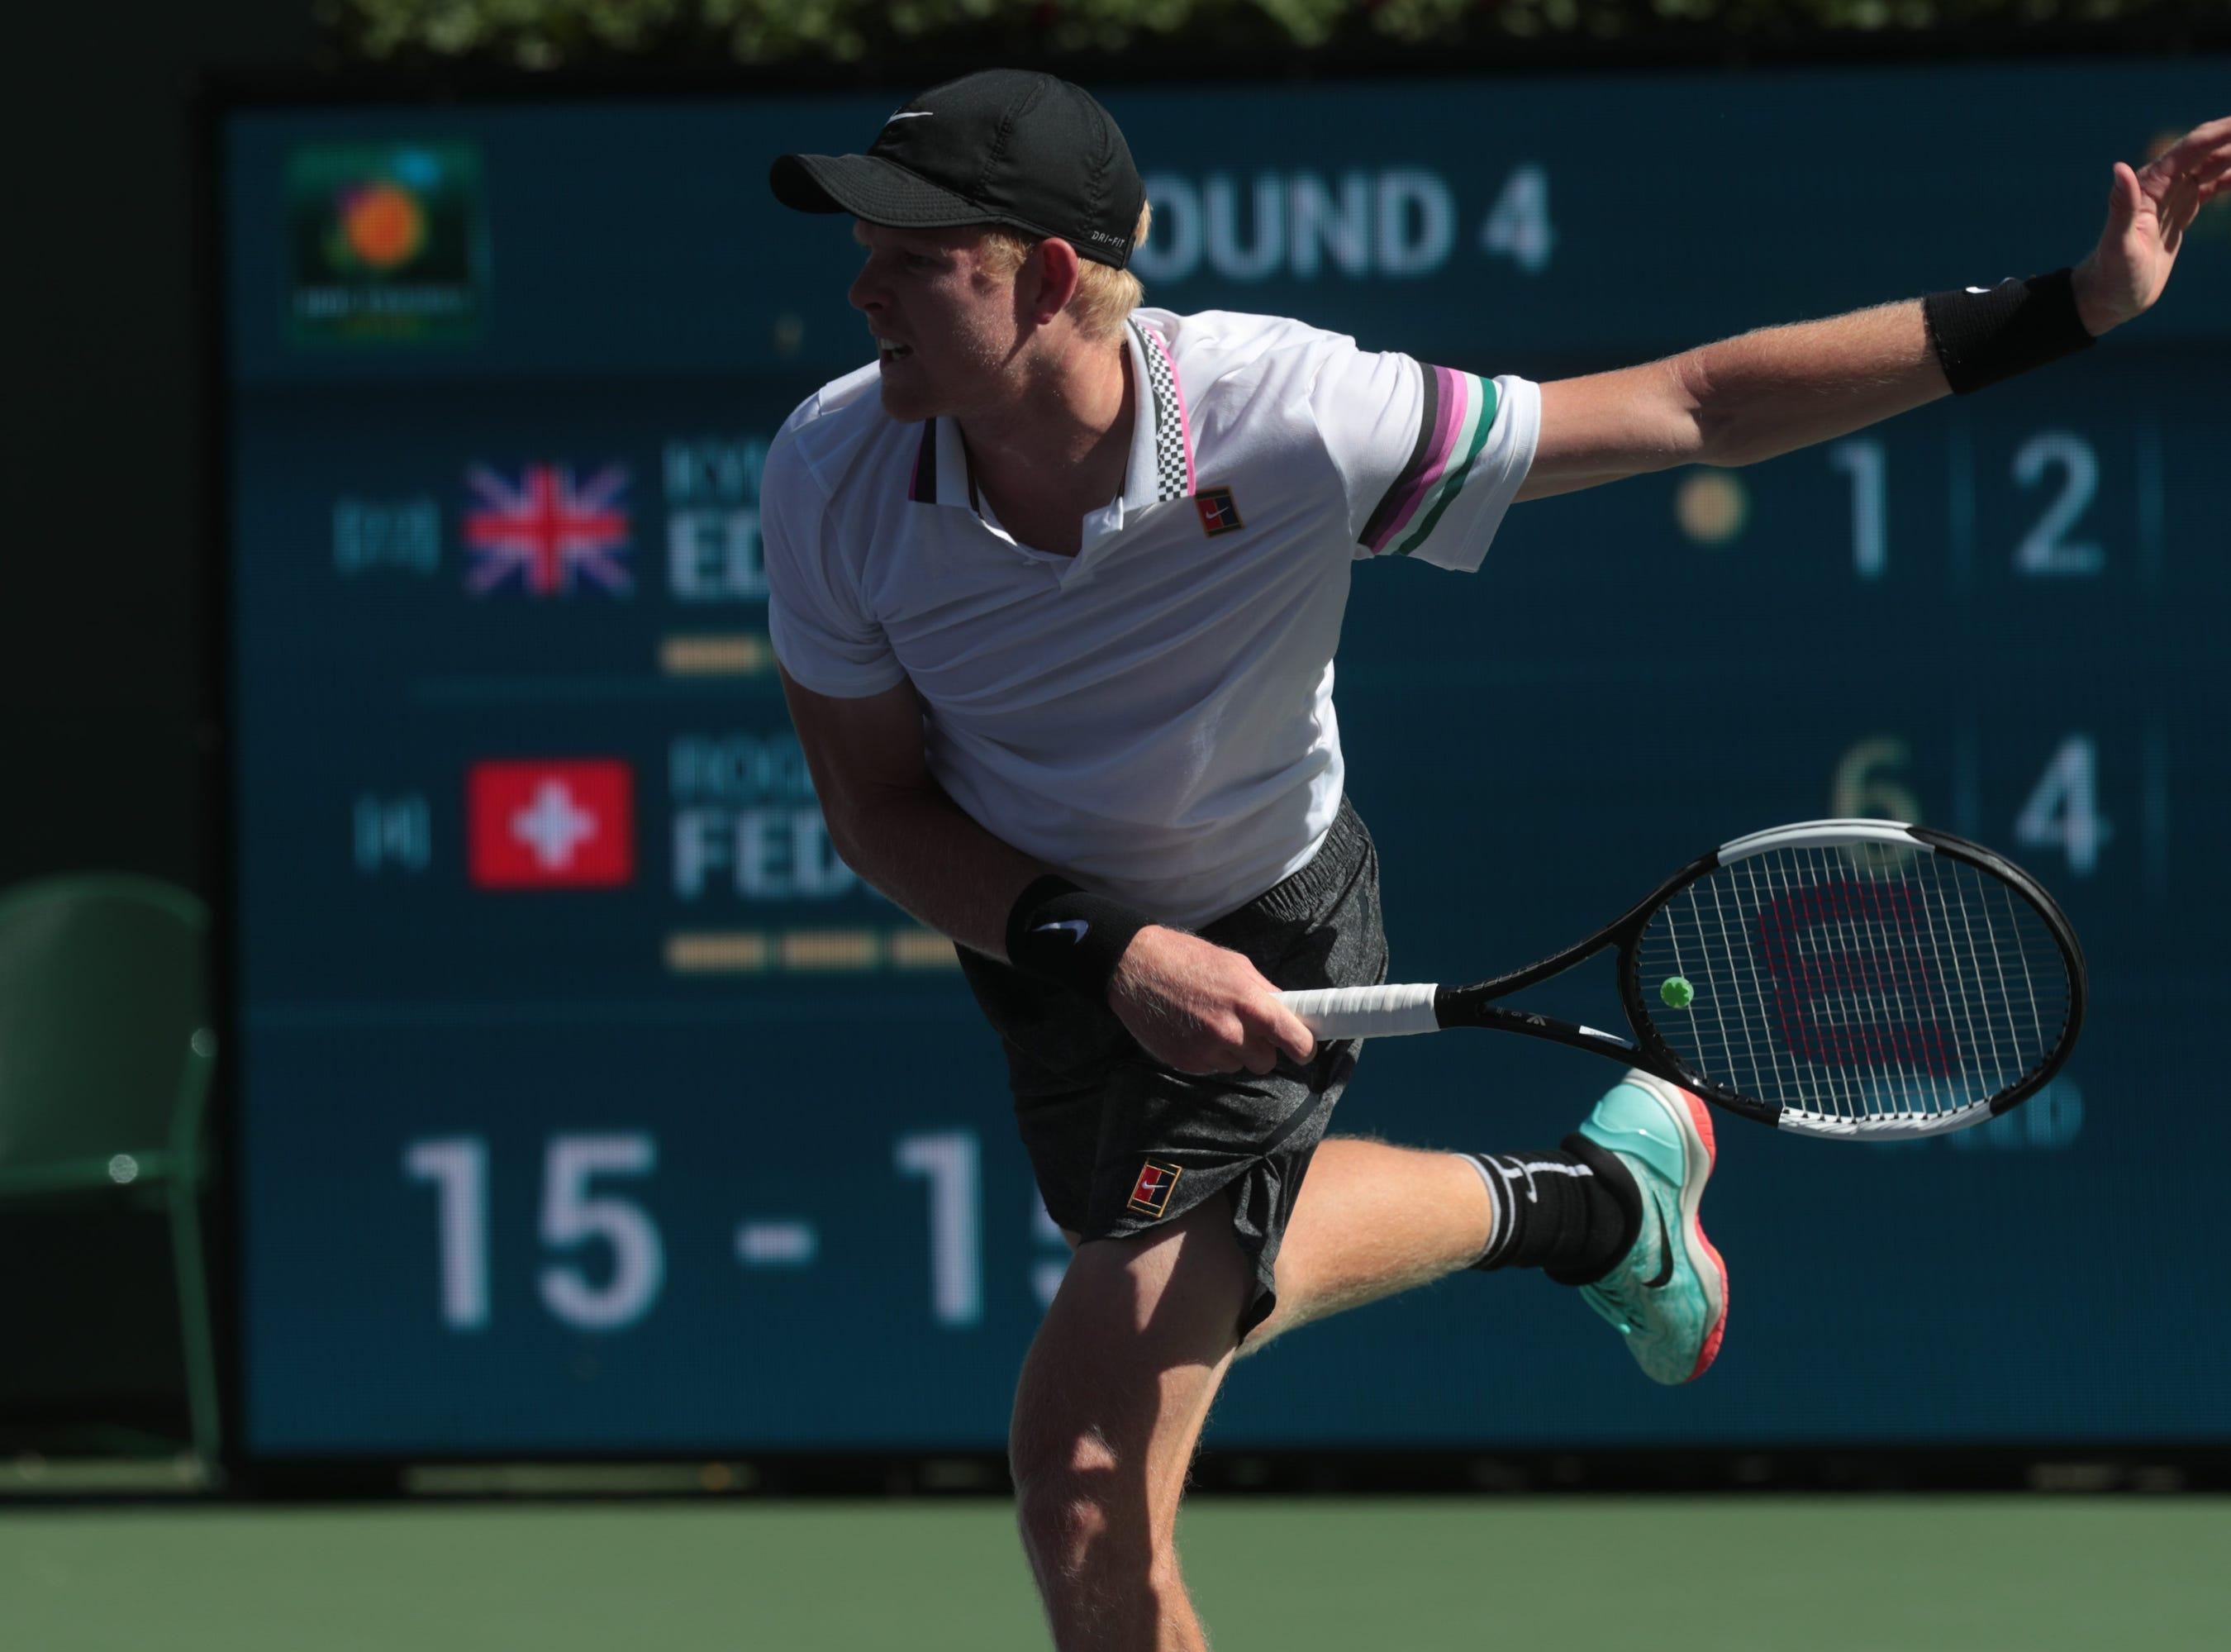 Kyle Edmund serves to Roger Federer at the BNP Paribas Open in Indian Wells, Calif., March 13, 2019.